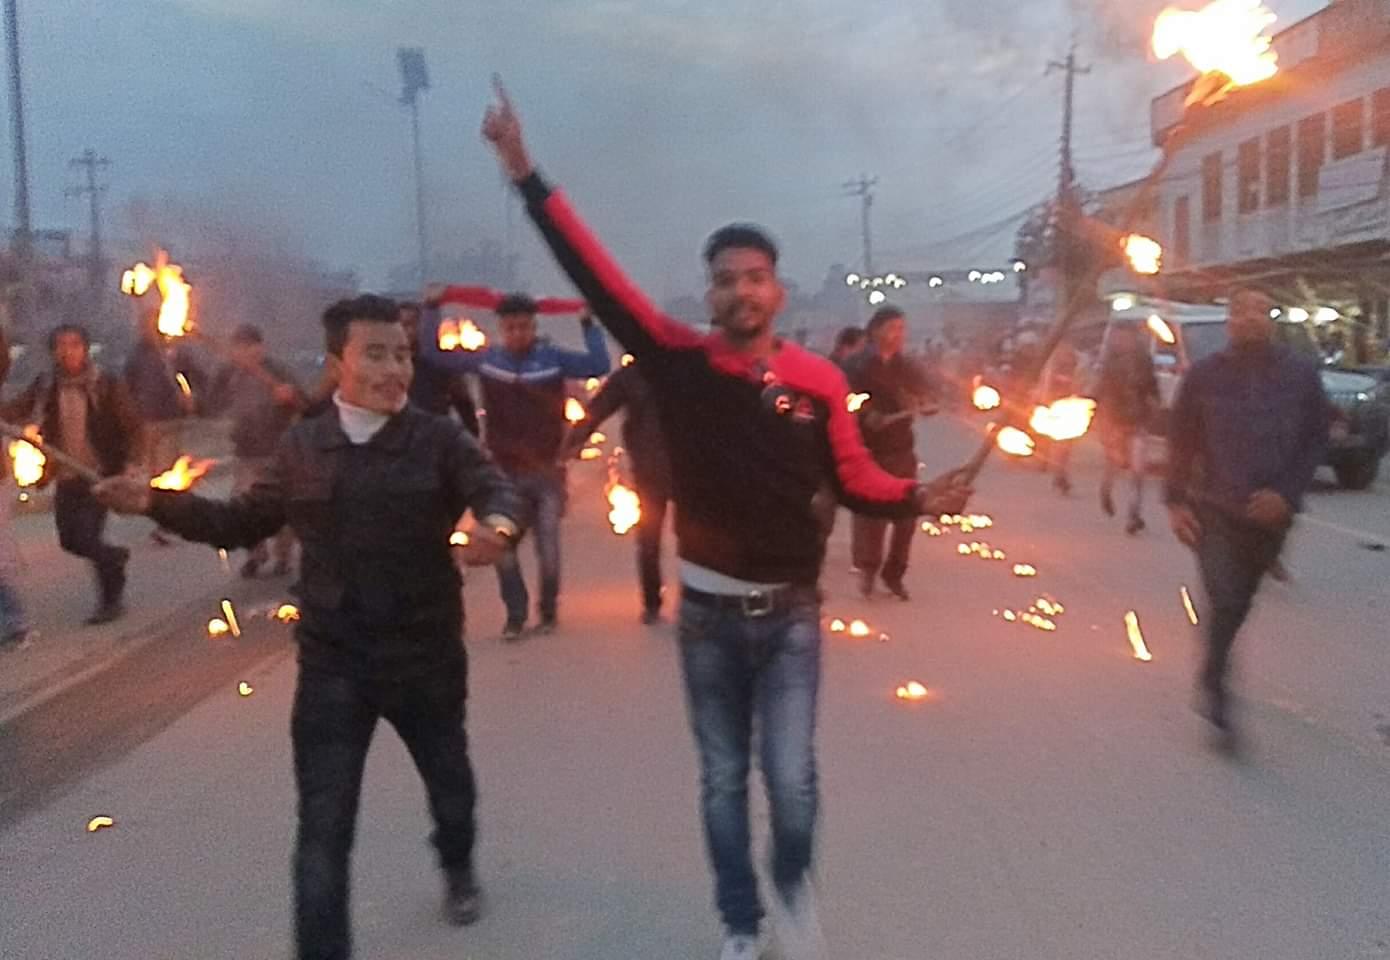 नेपाल विद्यार्थी संघ बाँकेले सरकार विरुद्ध  नेपालगन्जमा मसाल जुलुस